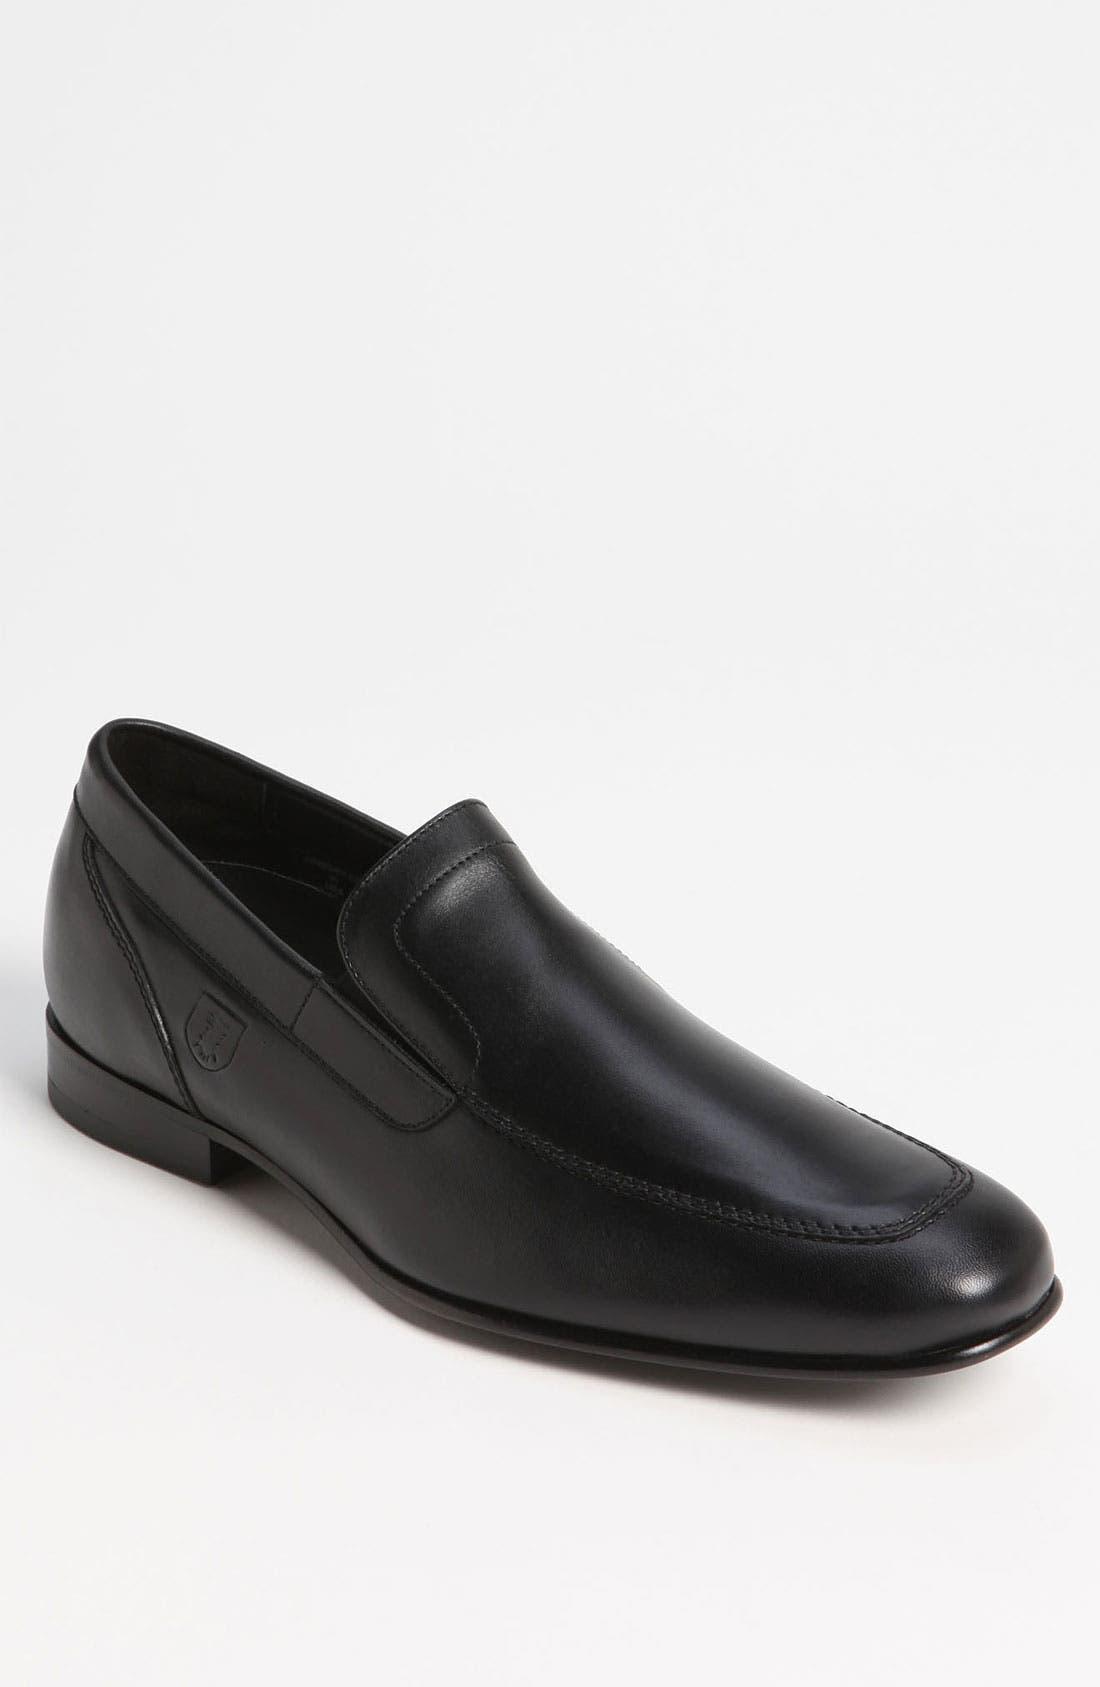 Alternate Image 1 Selected - Neil M 'Clemments' Loafer